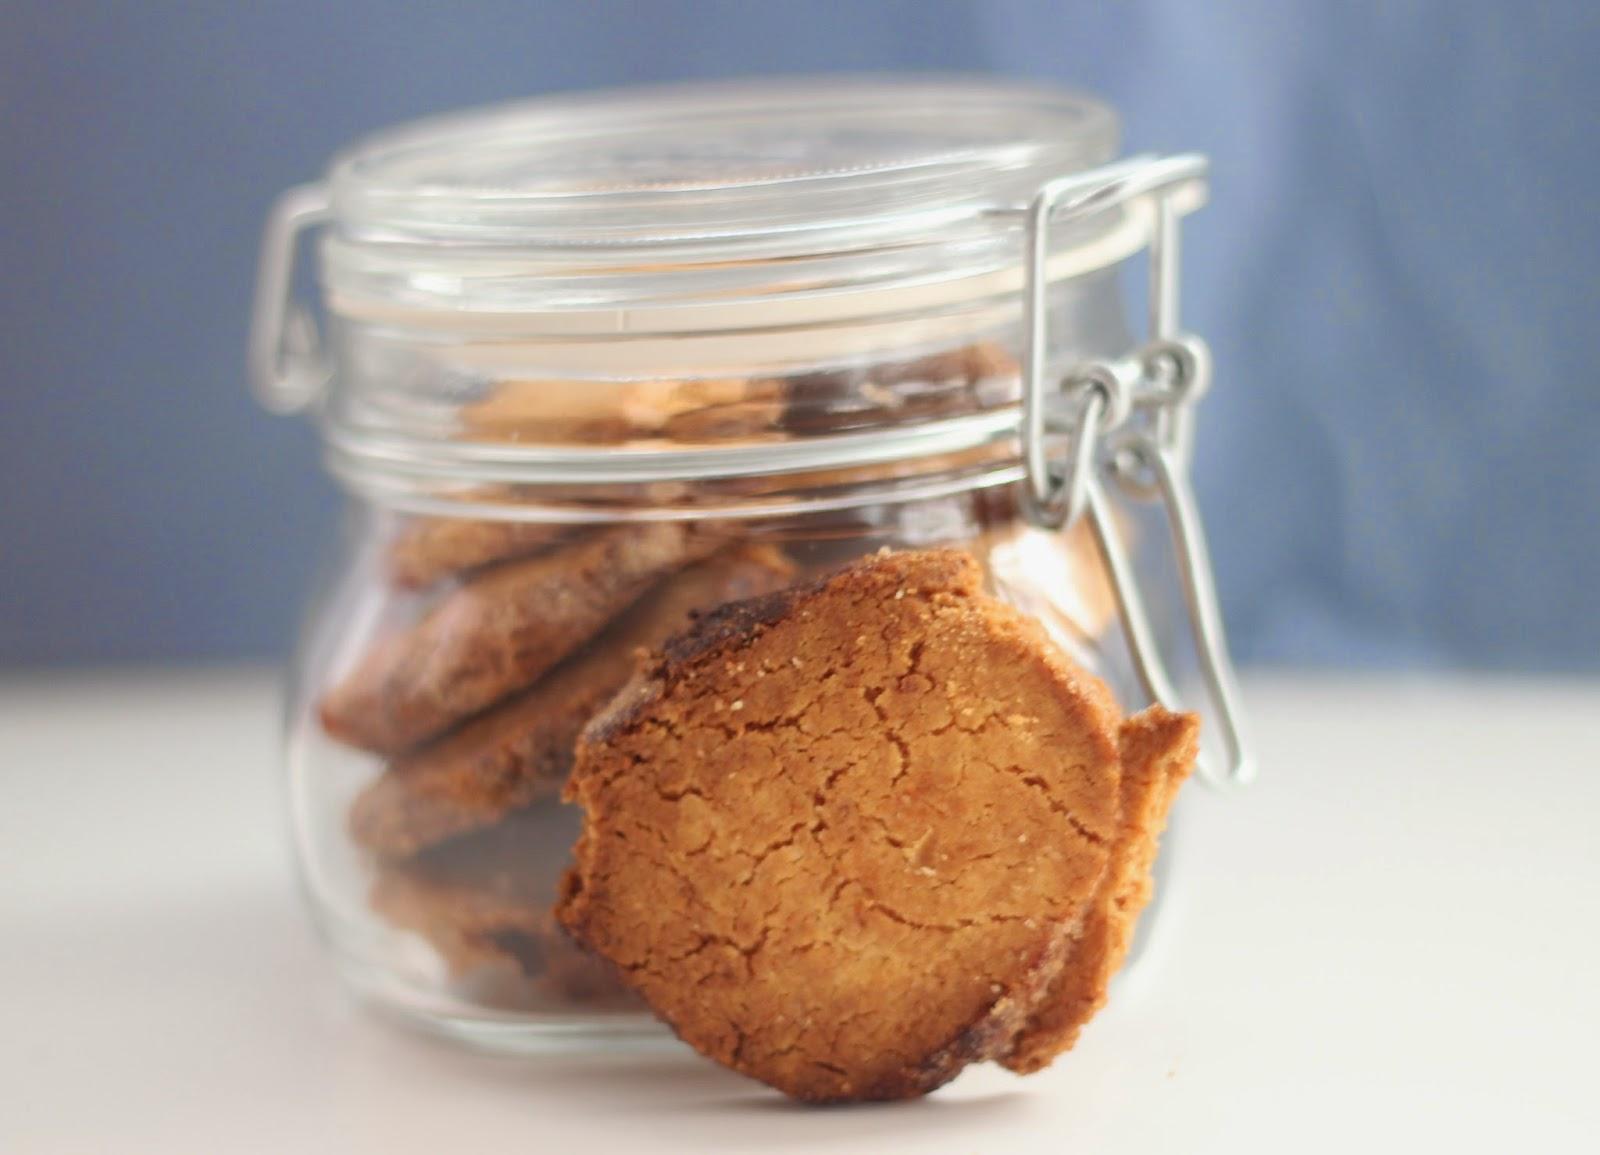 photo-como-preparar-galletas_de_naranja-para-regalar-en-bote-etiqueta